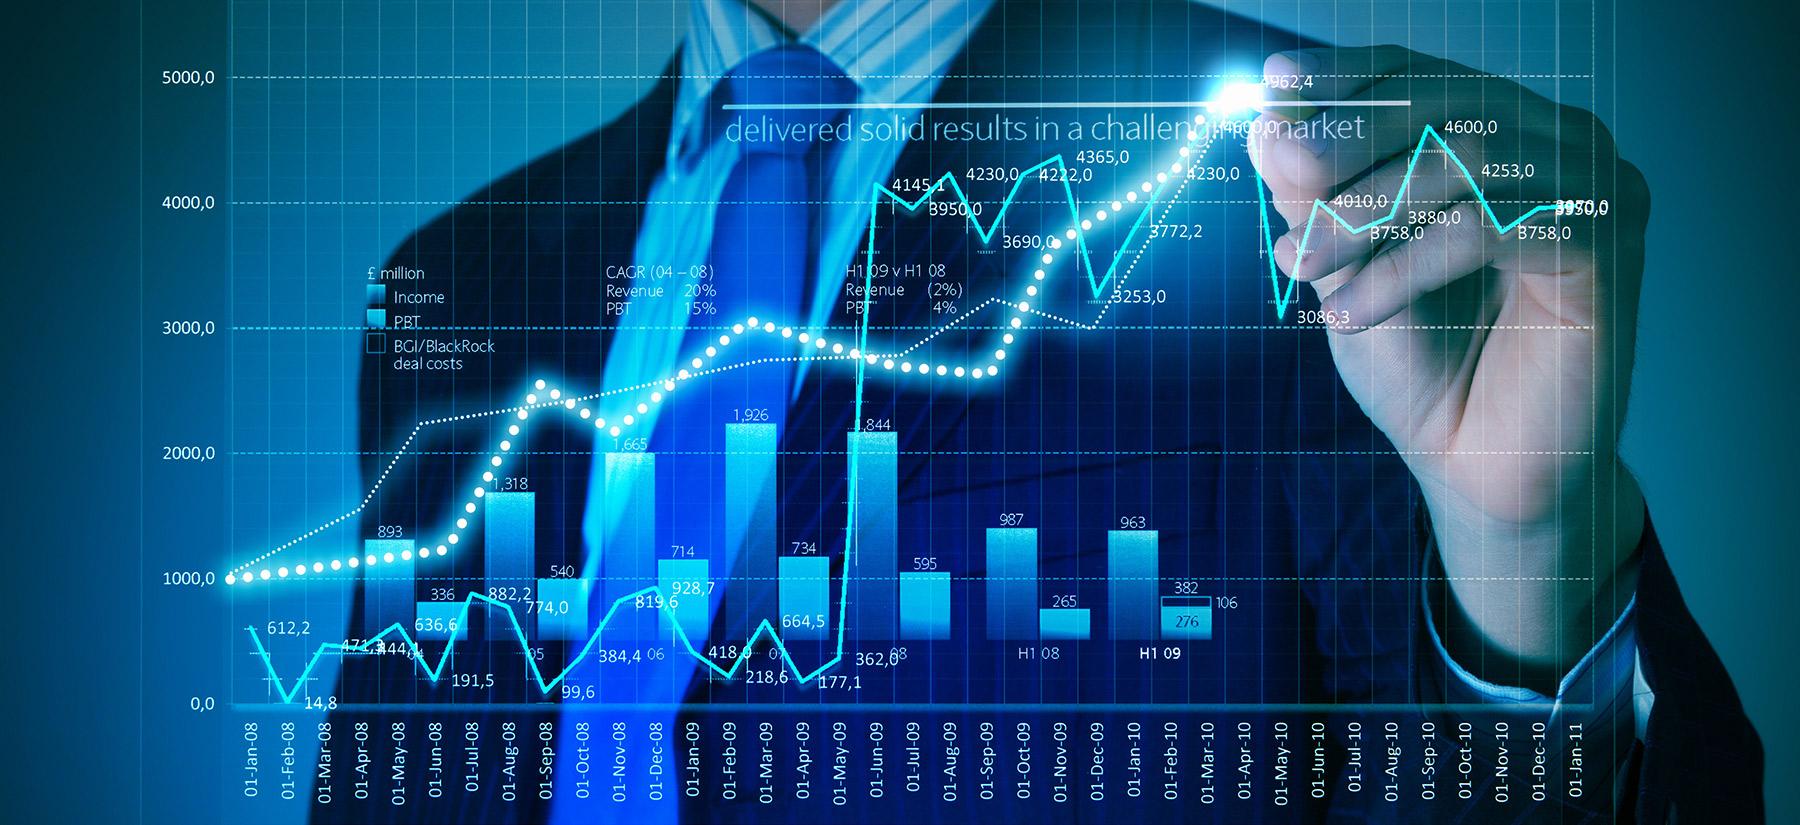 Investor Relations - Tata BlueScope SteelTata BlueScope Steel